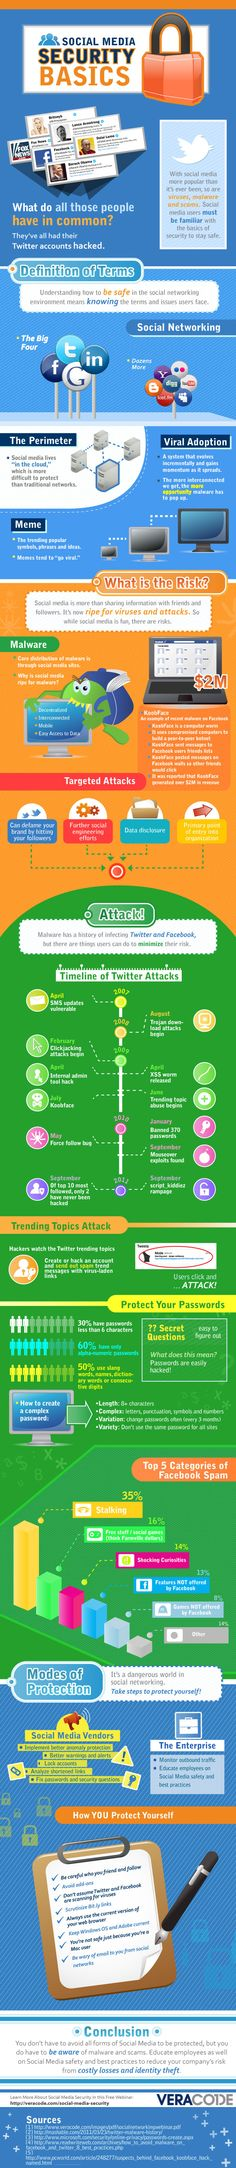 Social Media #Security Basics #infography